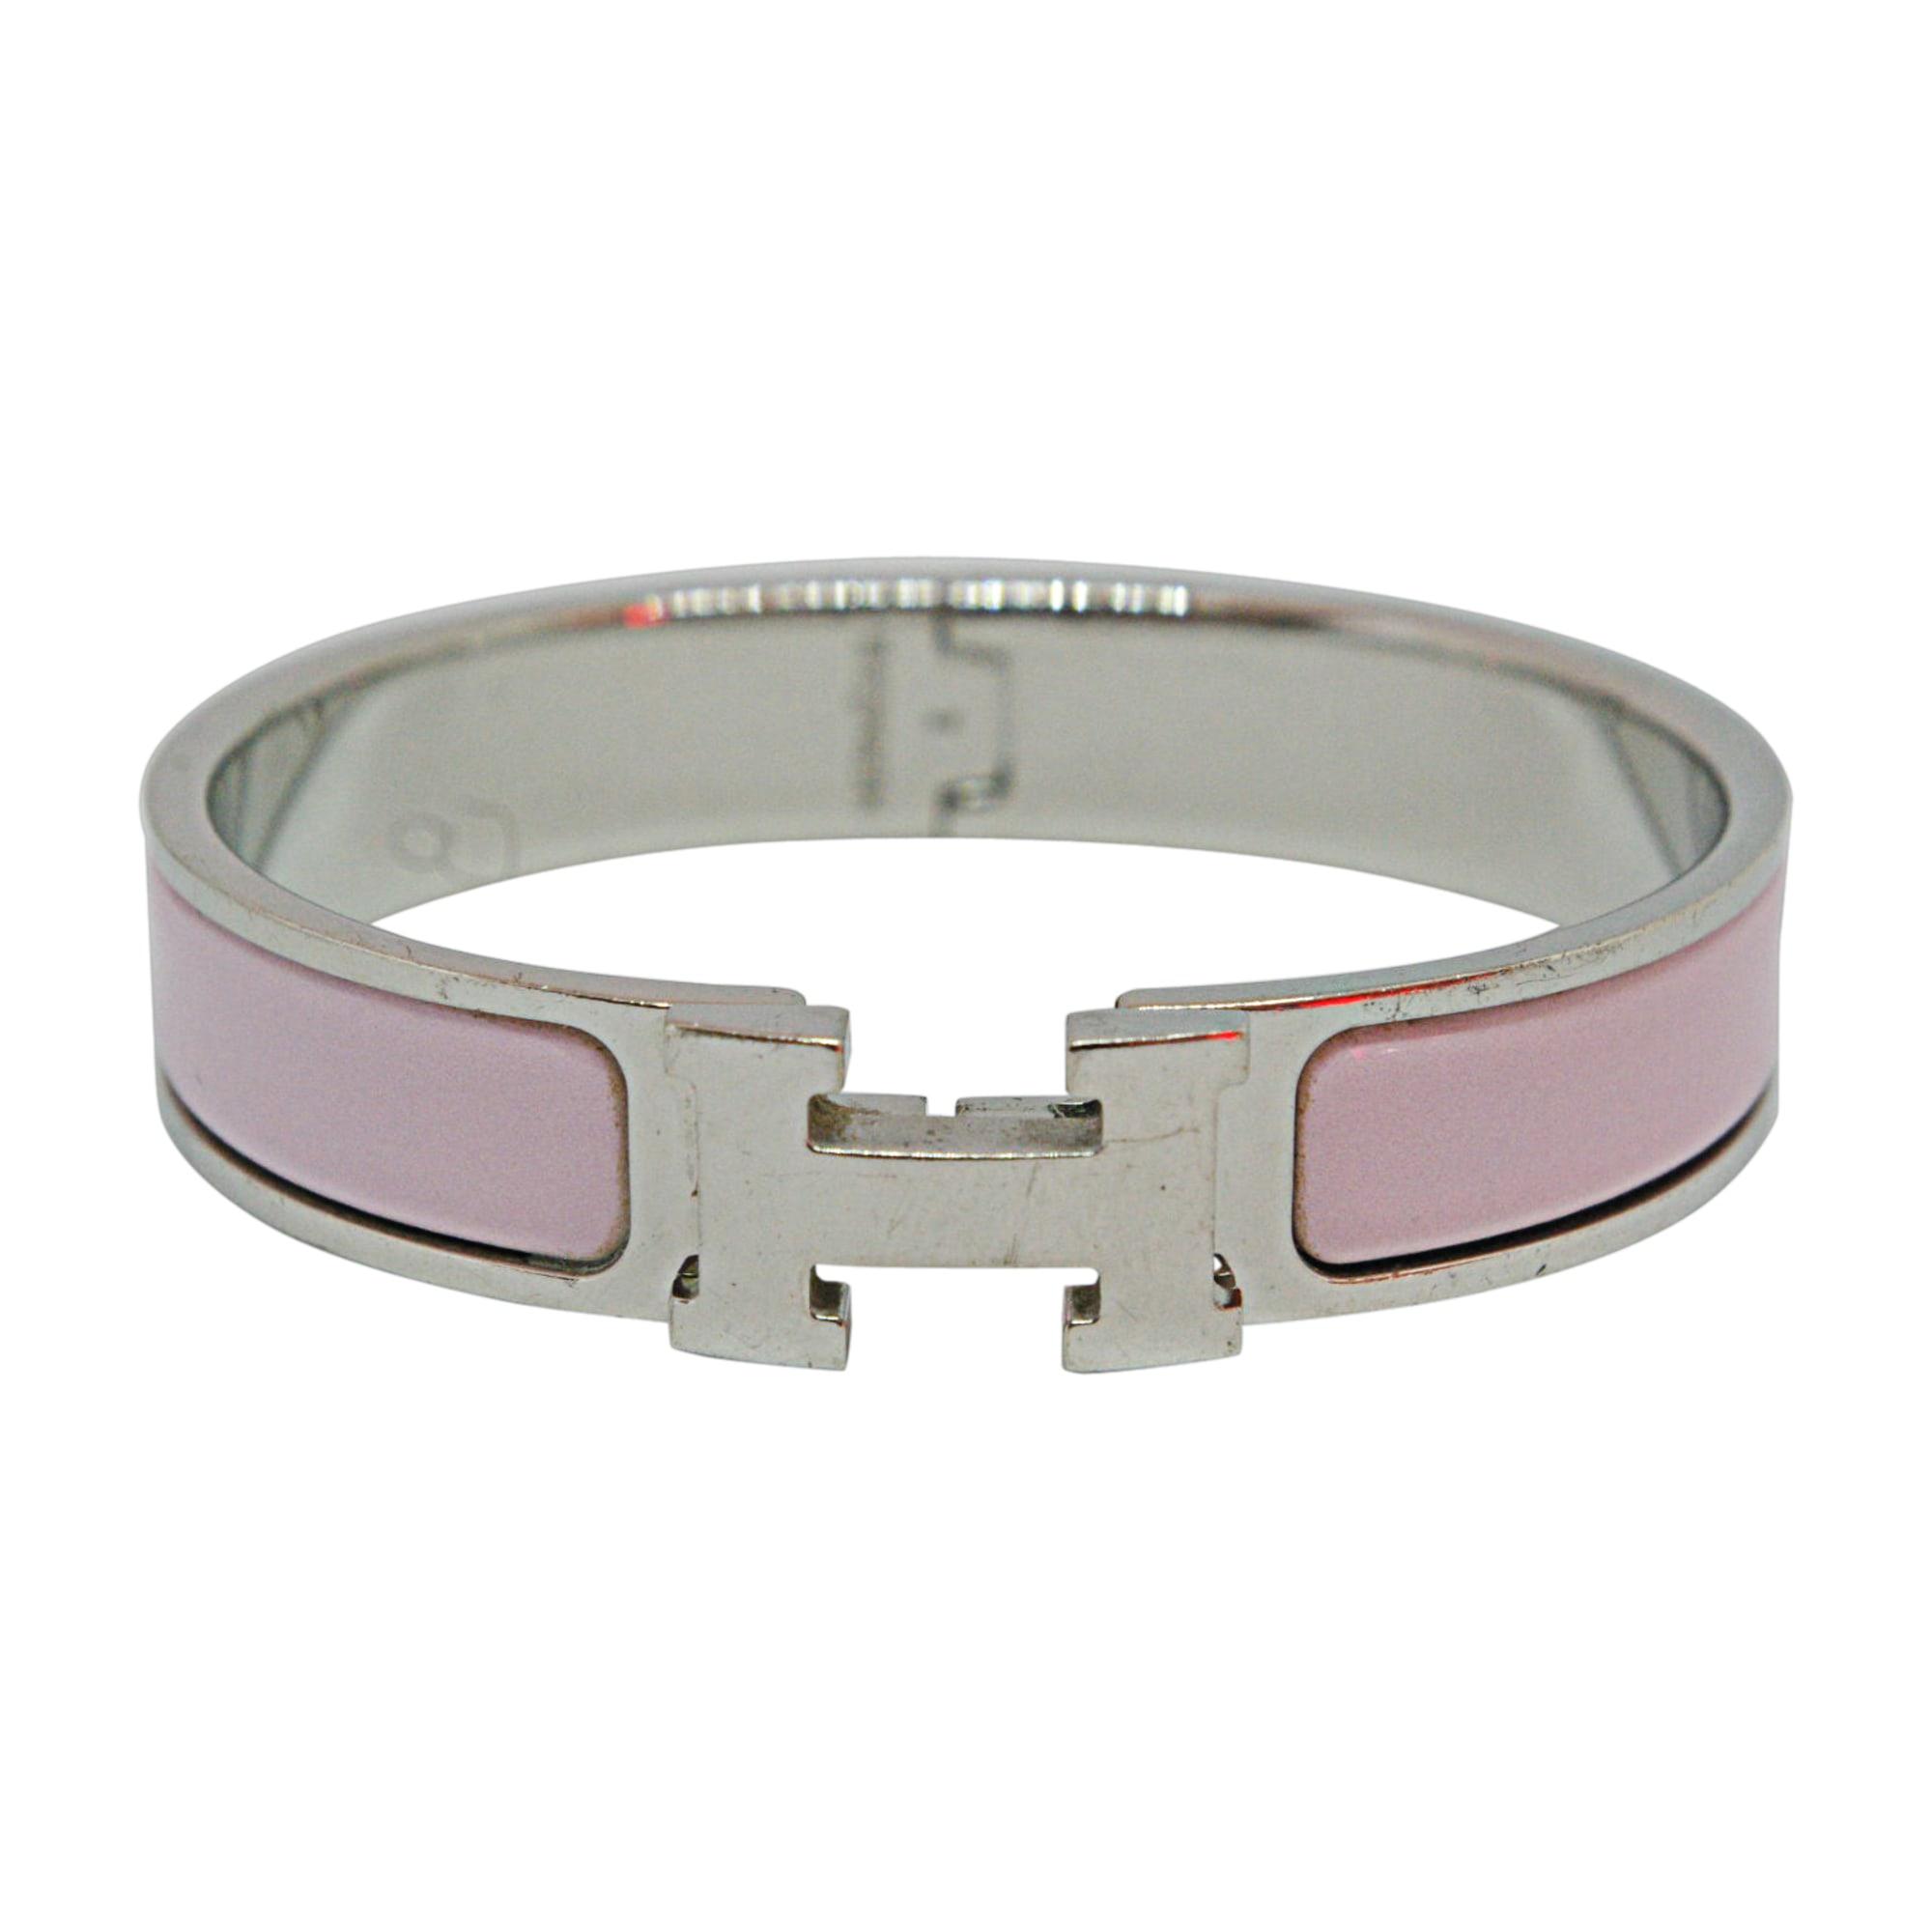 Bracelet HERMÈS Clic H Pink, fuchsia, light pink